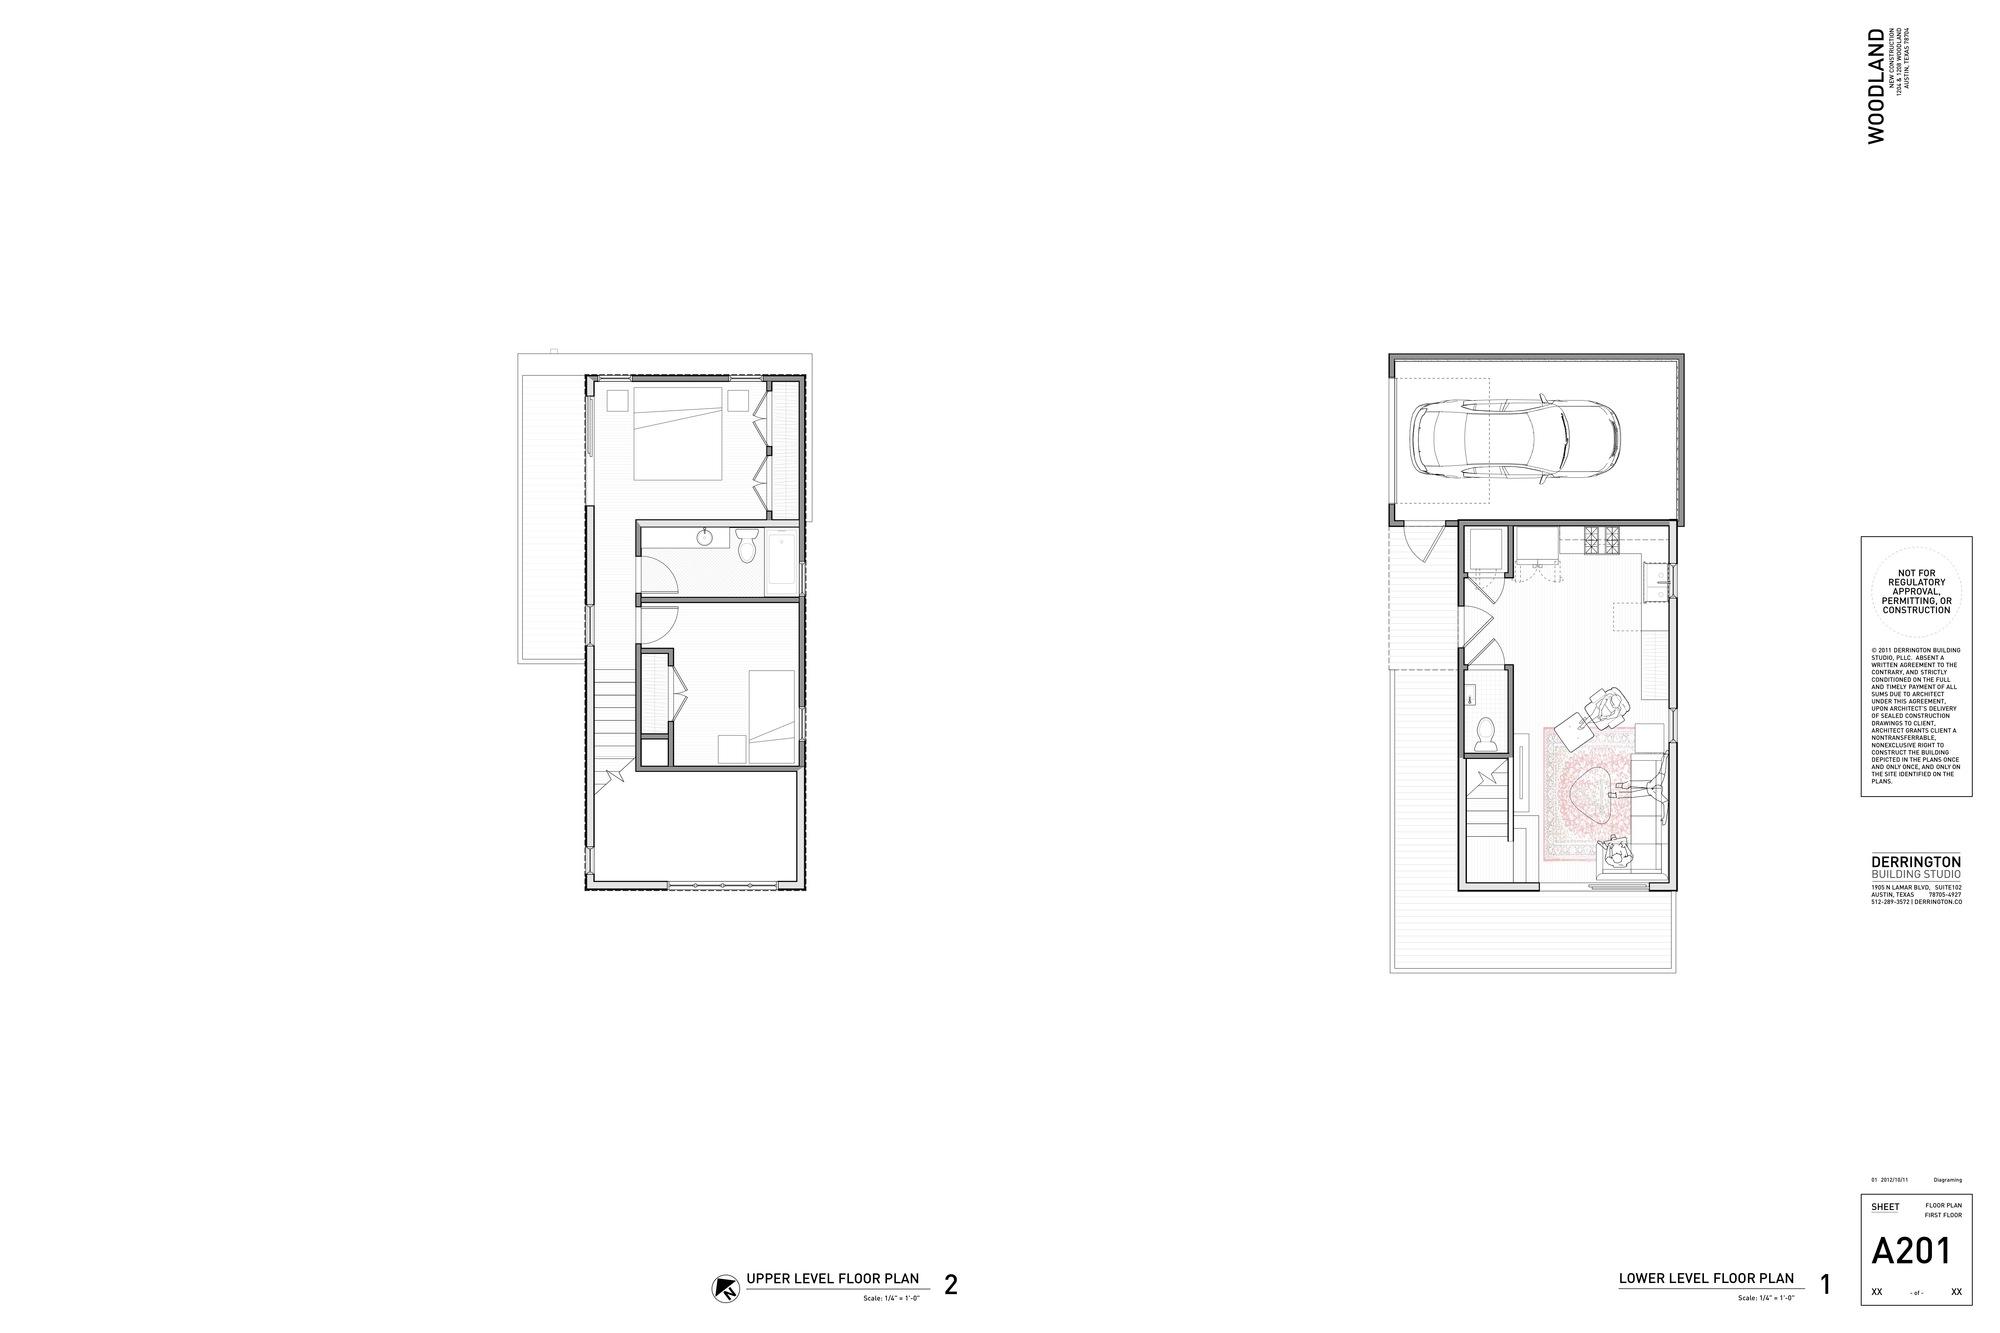 Gallery Of Woodland Residences Derrington Building Studio 17